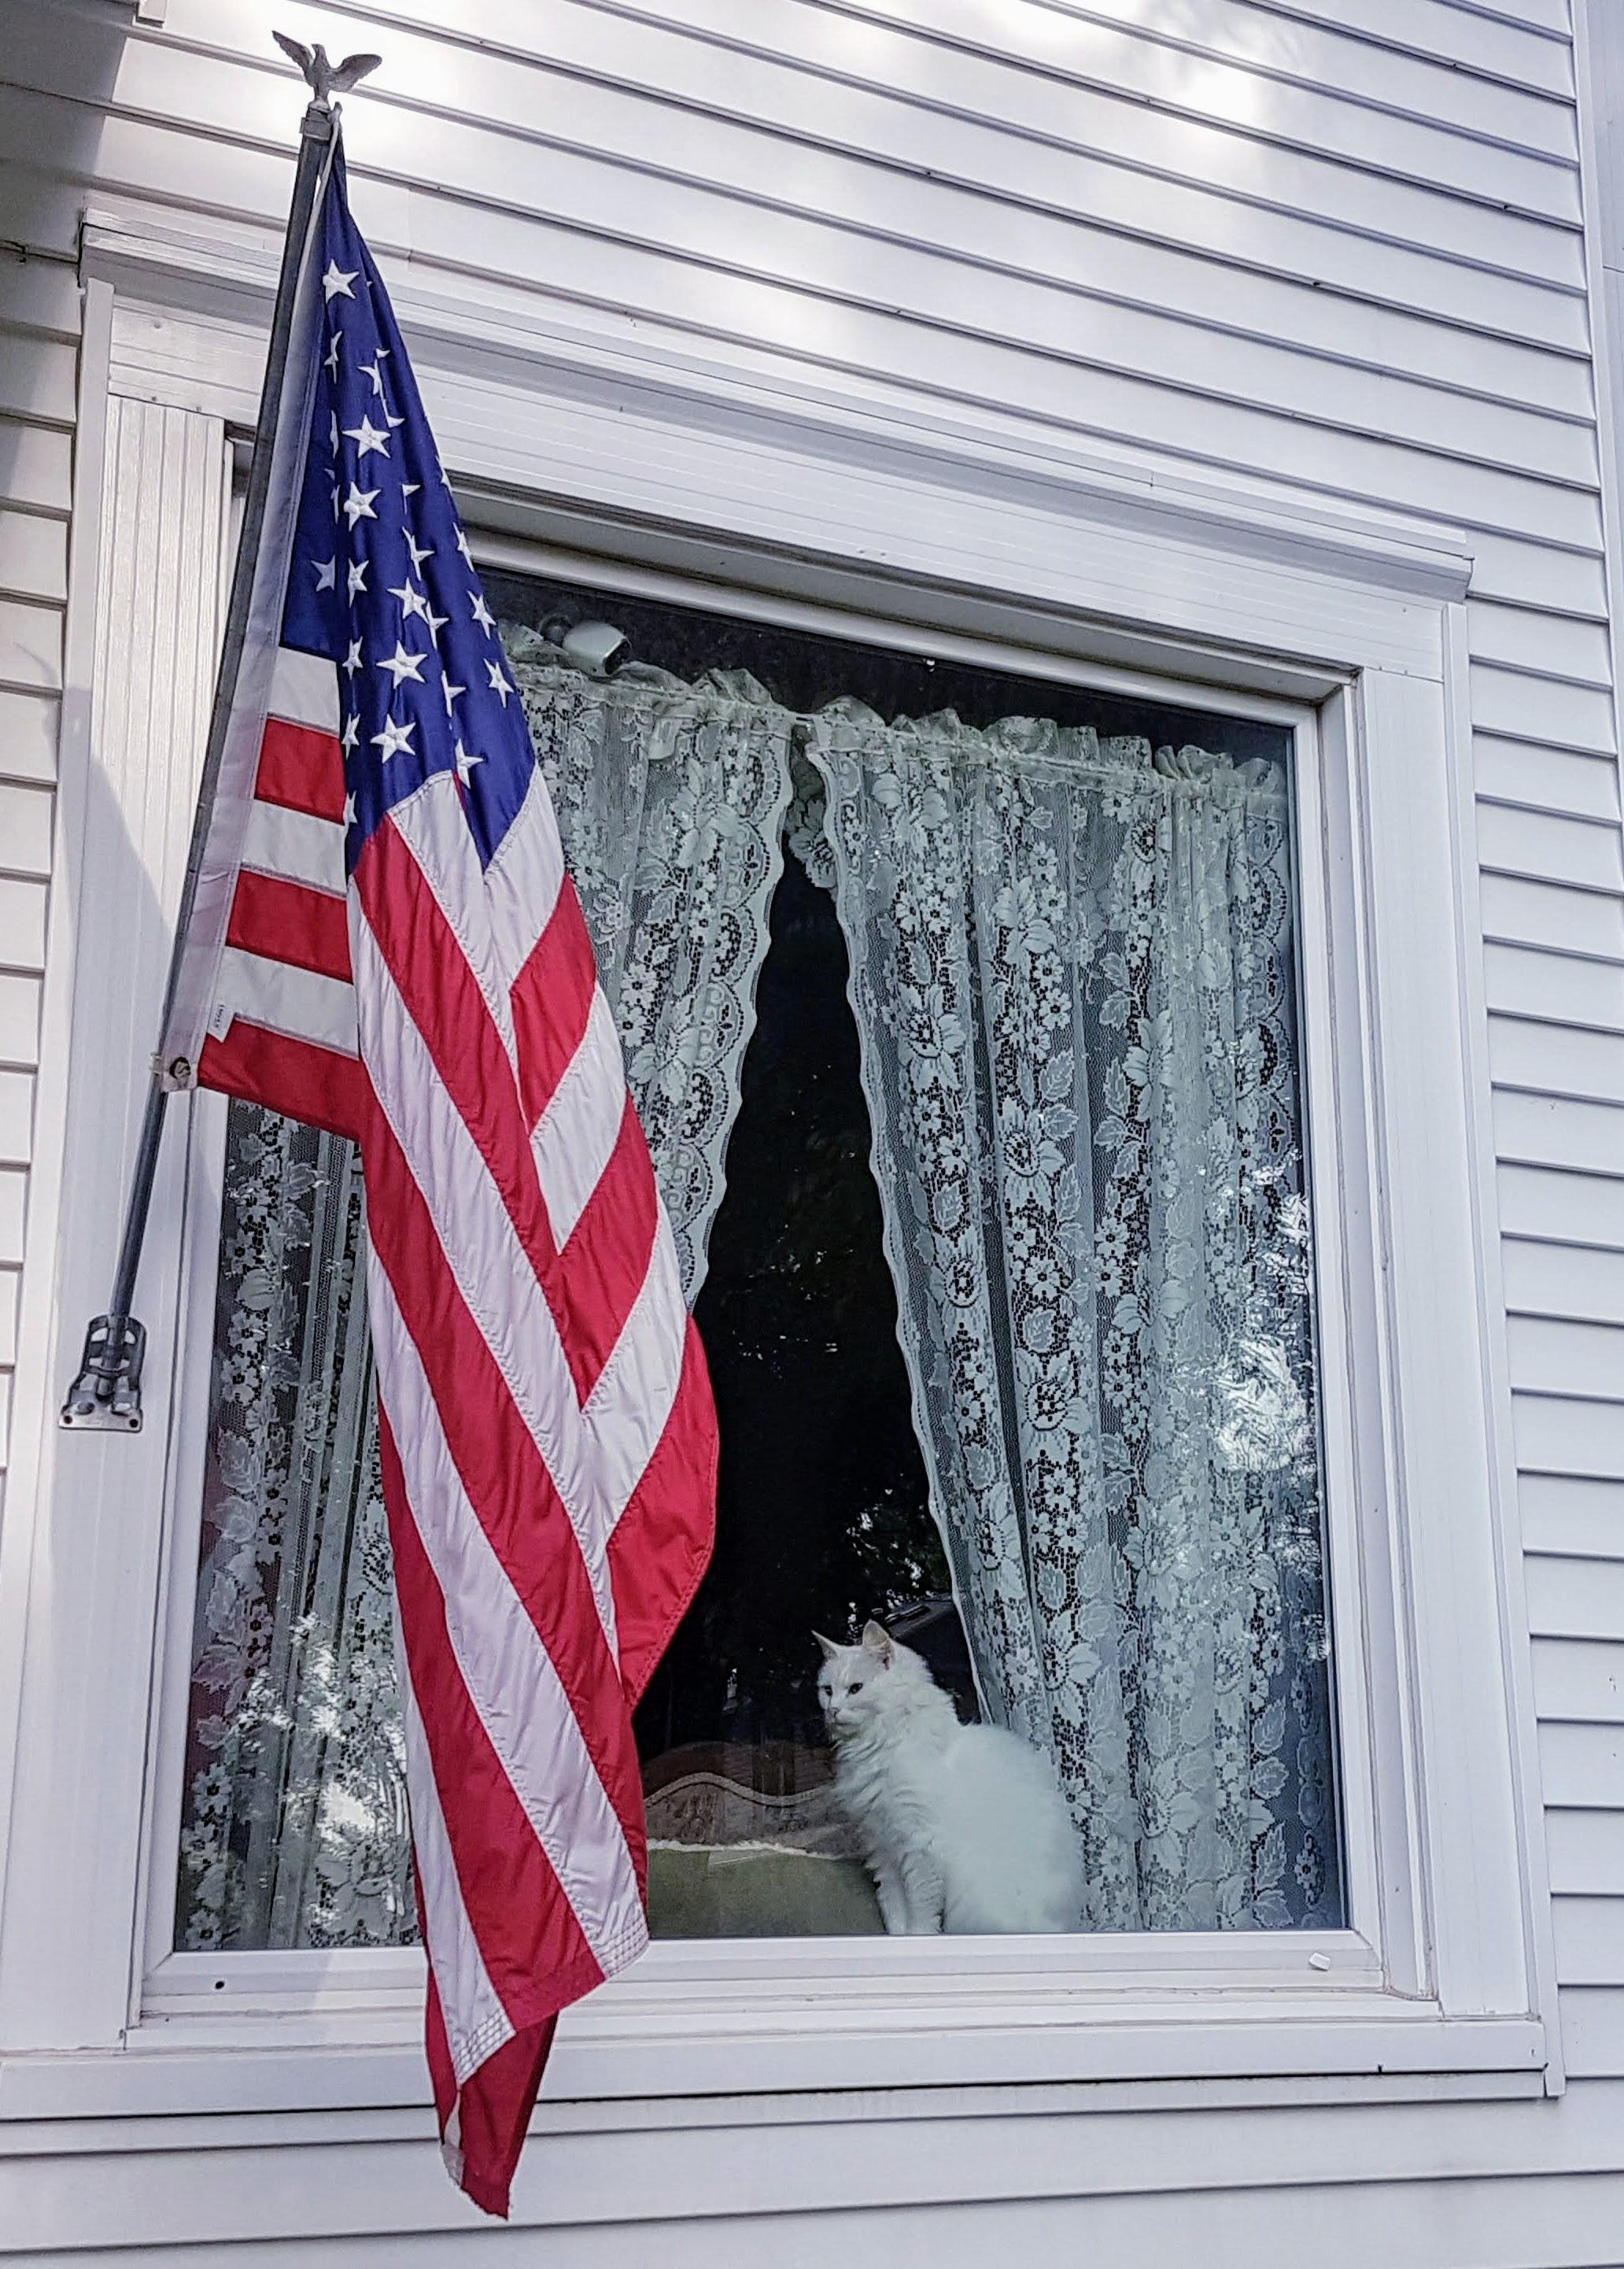 Free stock photo of #cat #window #USA